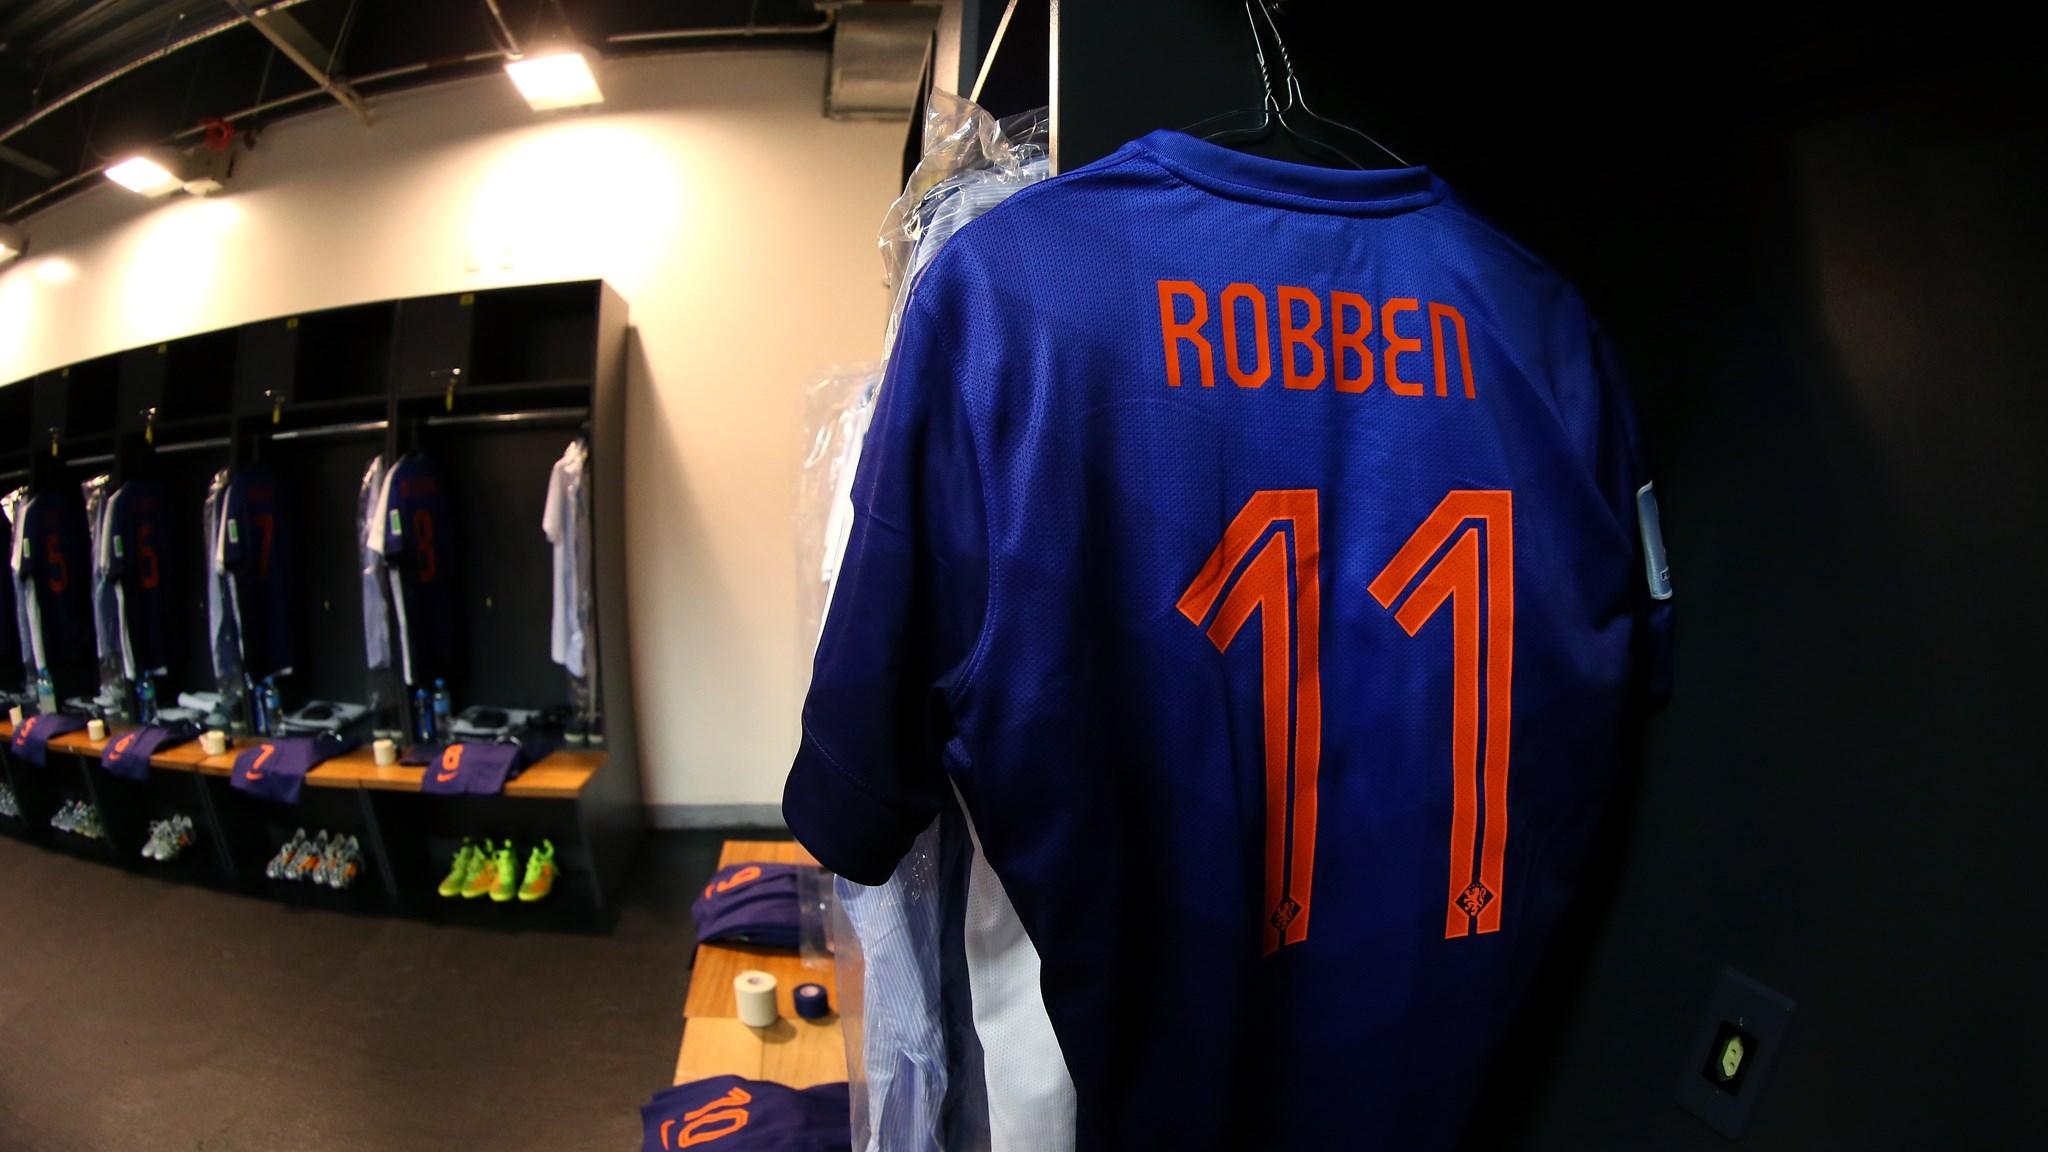 204 - Brazil-Netherlands [0-3] -- 12 Jul 2014 - 17-00 - kuaza